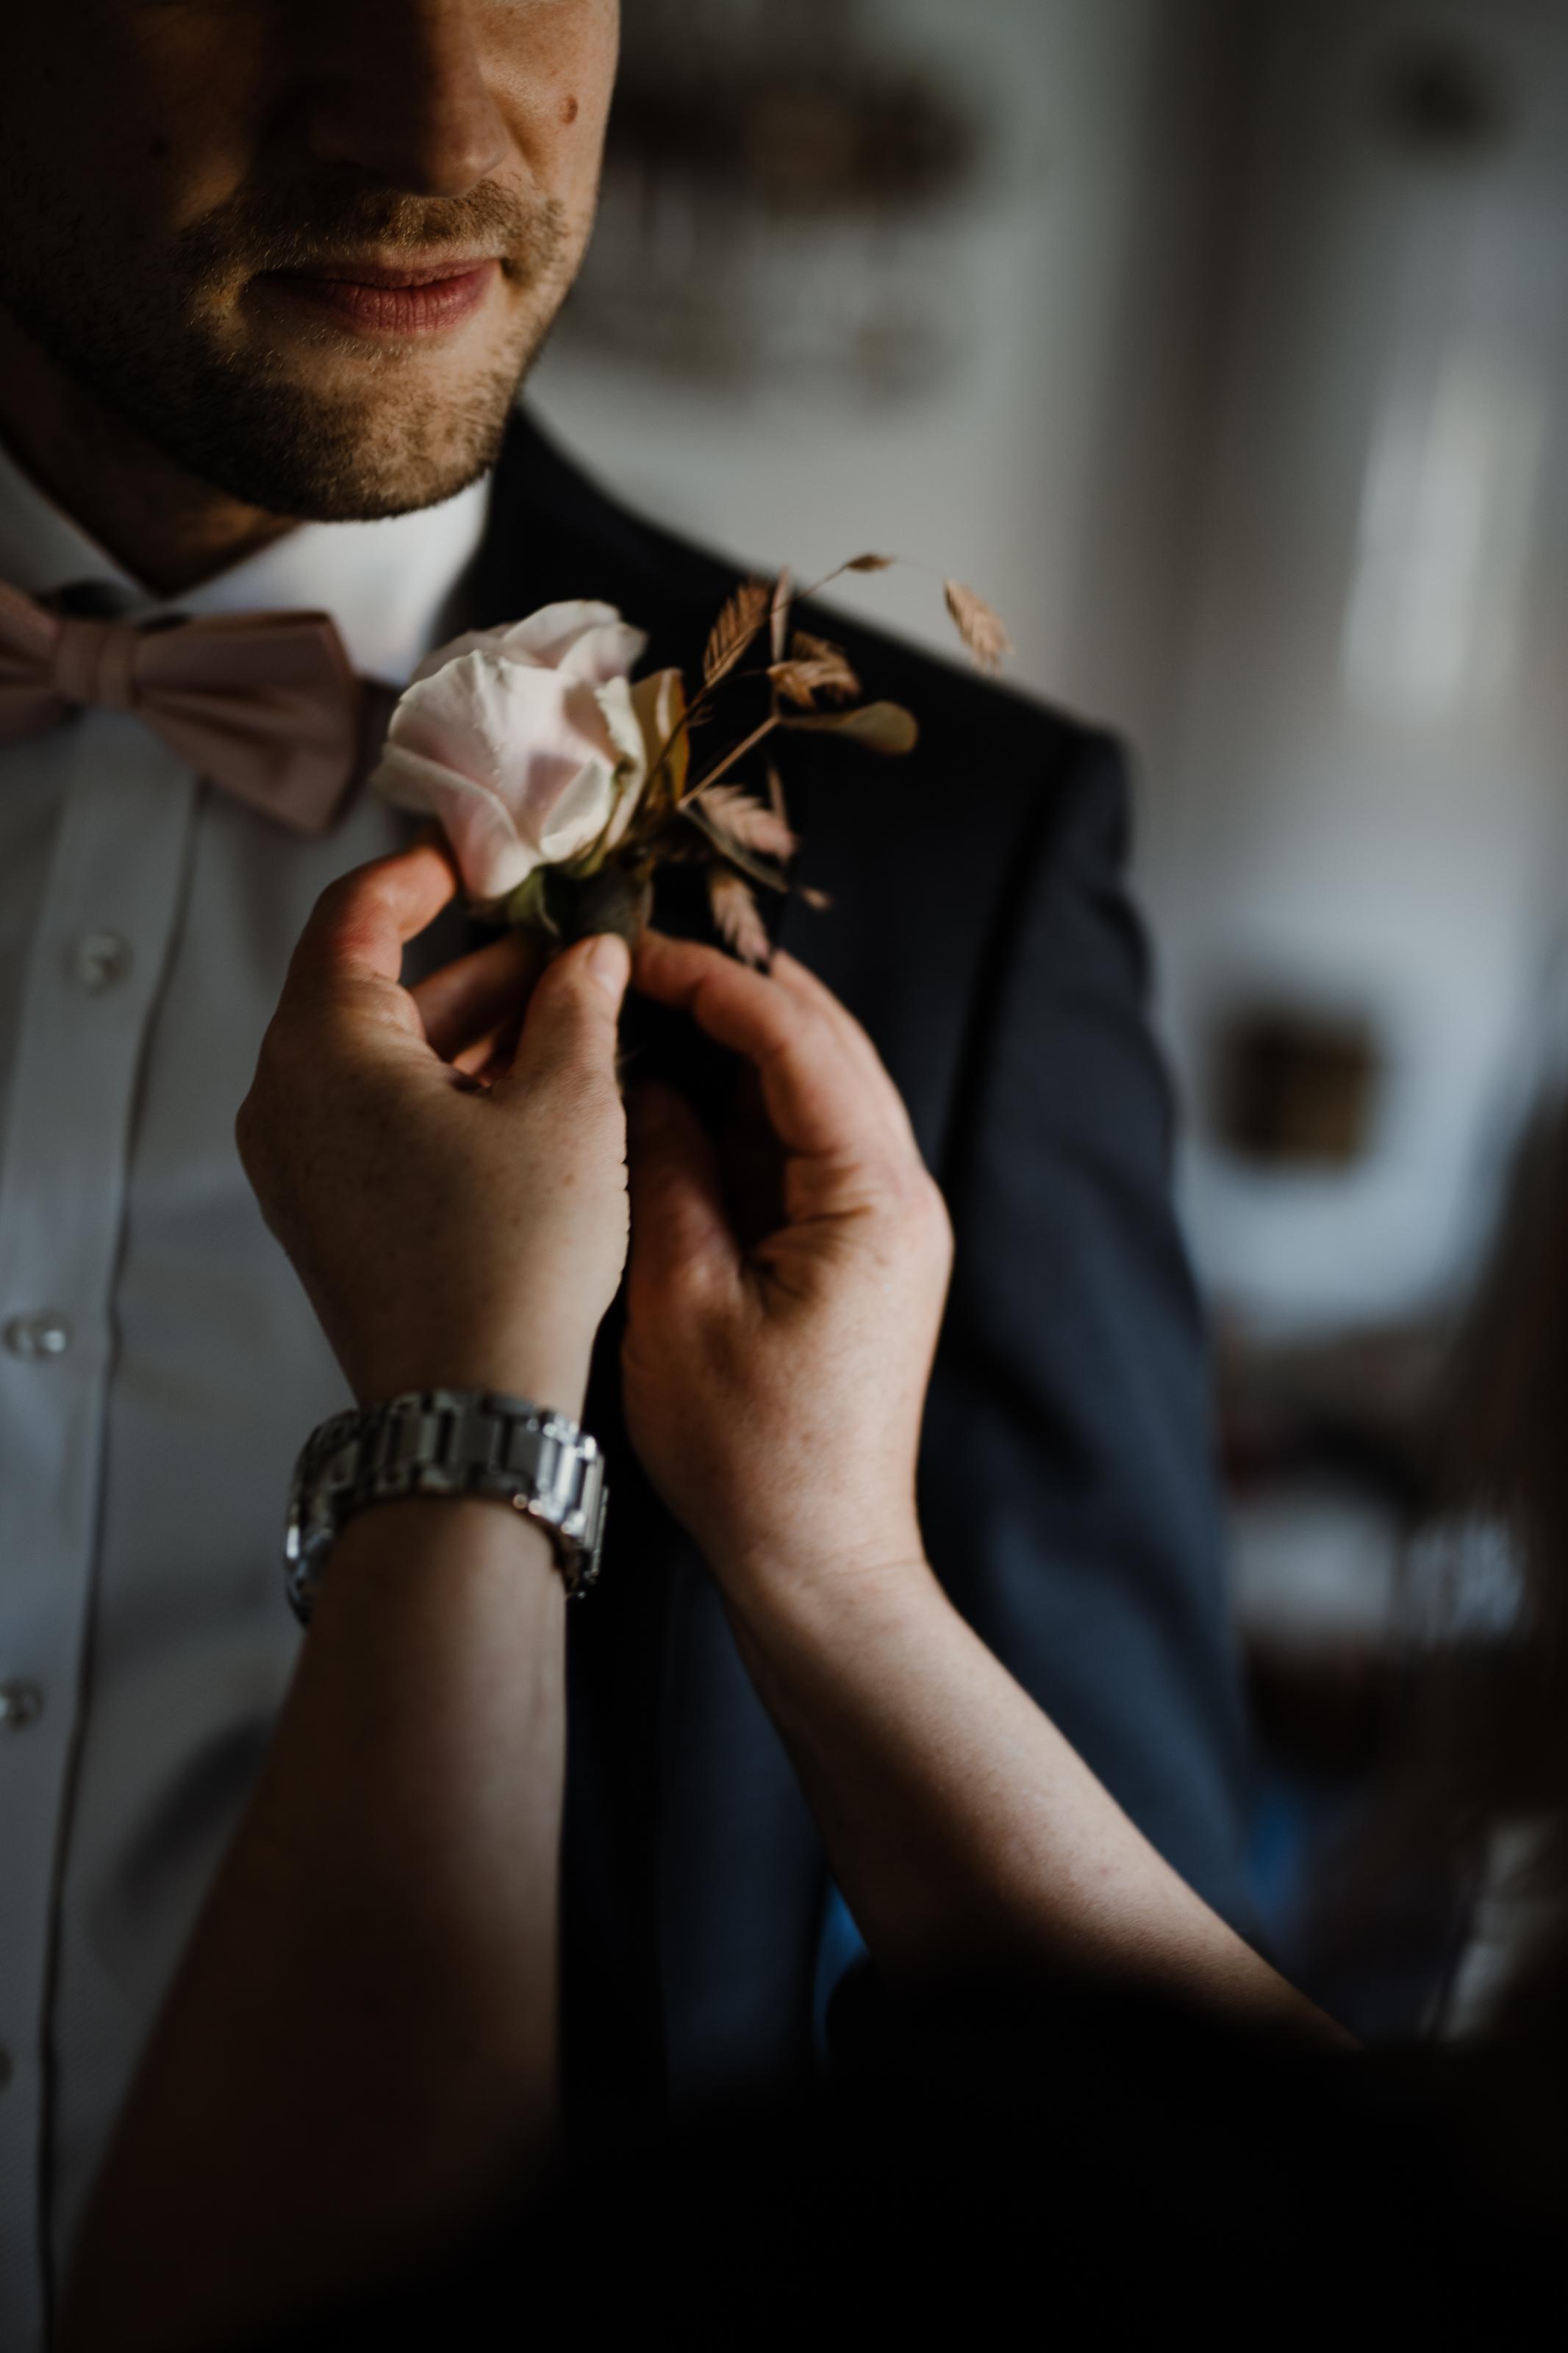 Bröllopsfotograf-Uddetorp Säteri-Höstbröllop-Fotograf Emilia- Bröllopsfotograf Borås-11.jpg